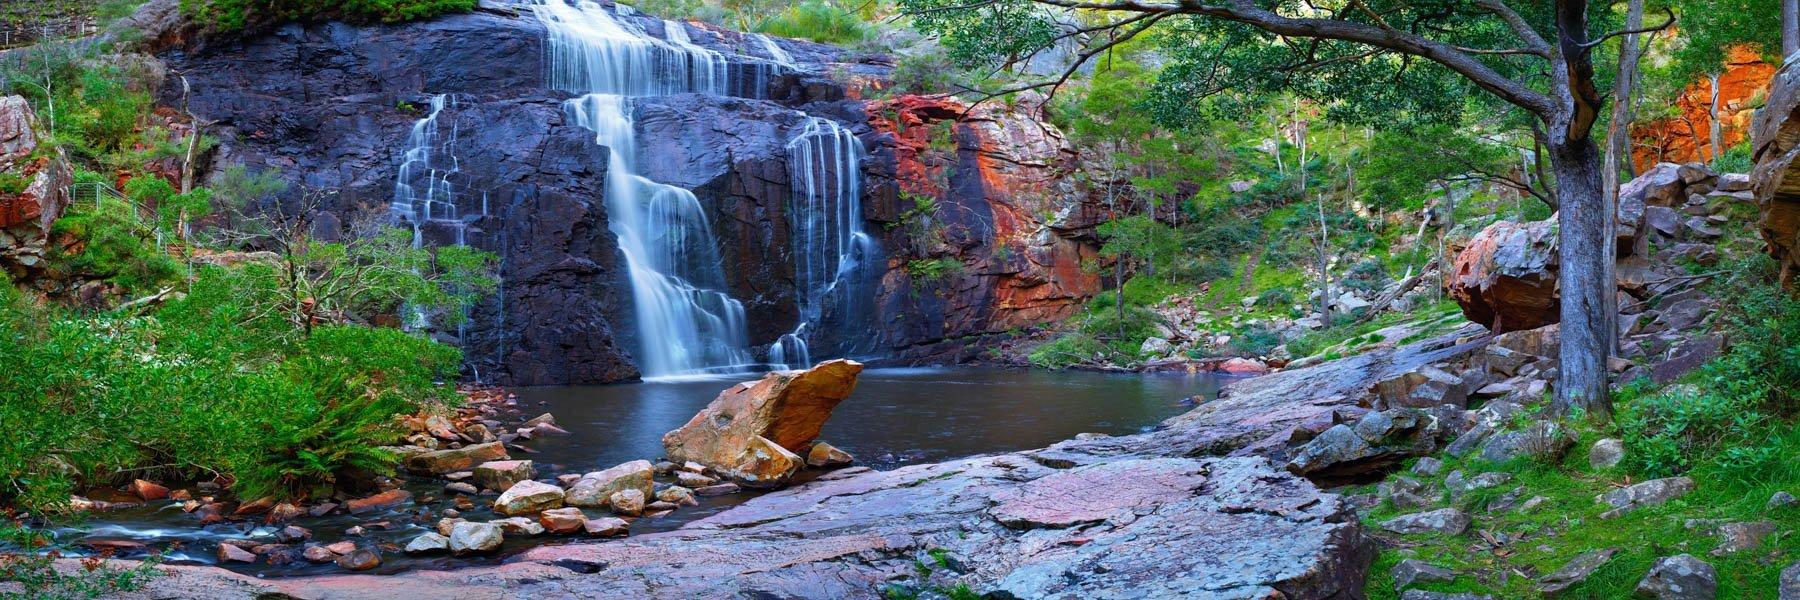 Mackenzie Falls, The Grampians, Victoria, Australia.